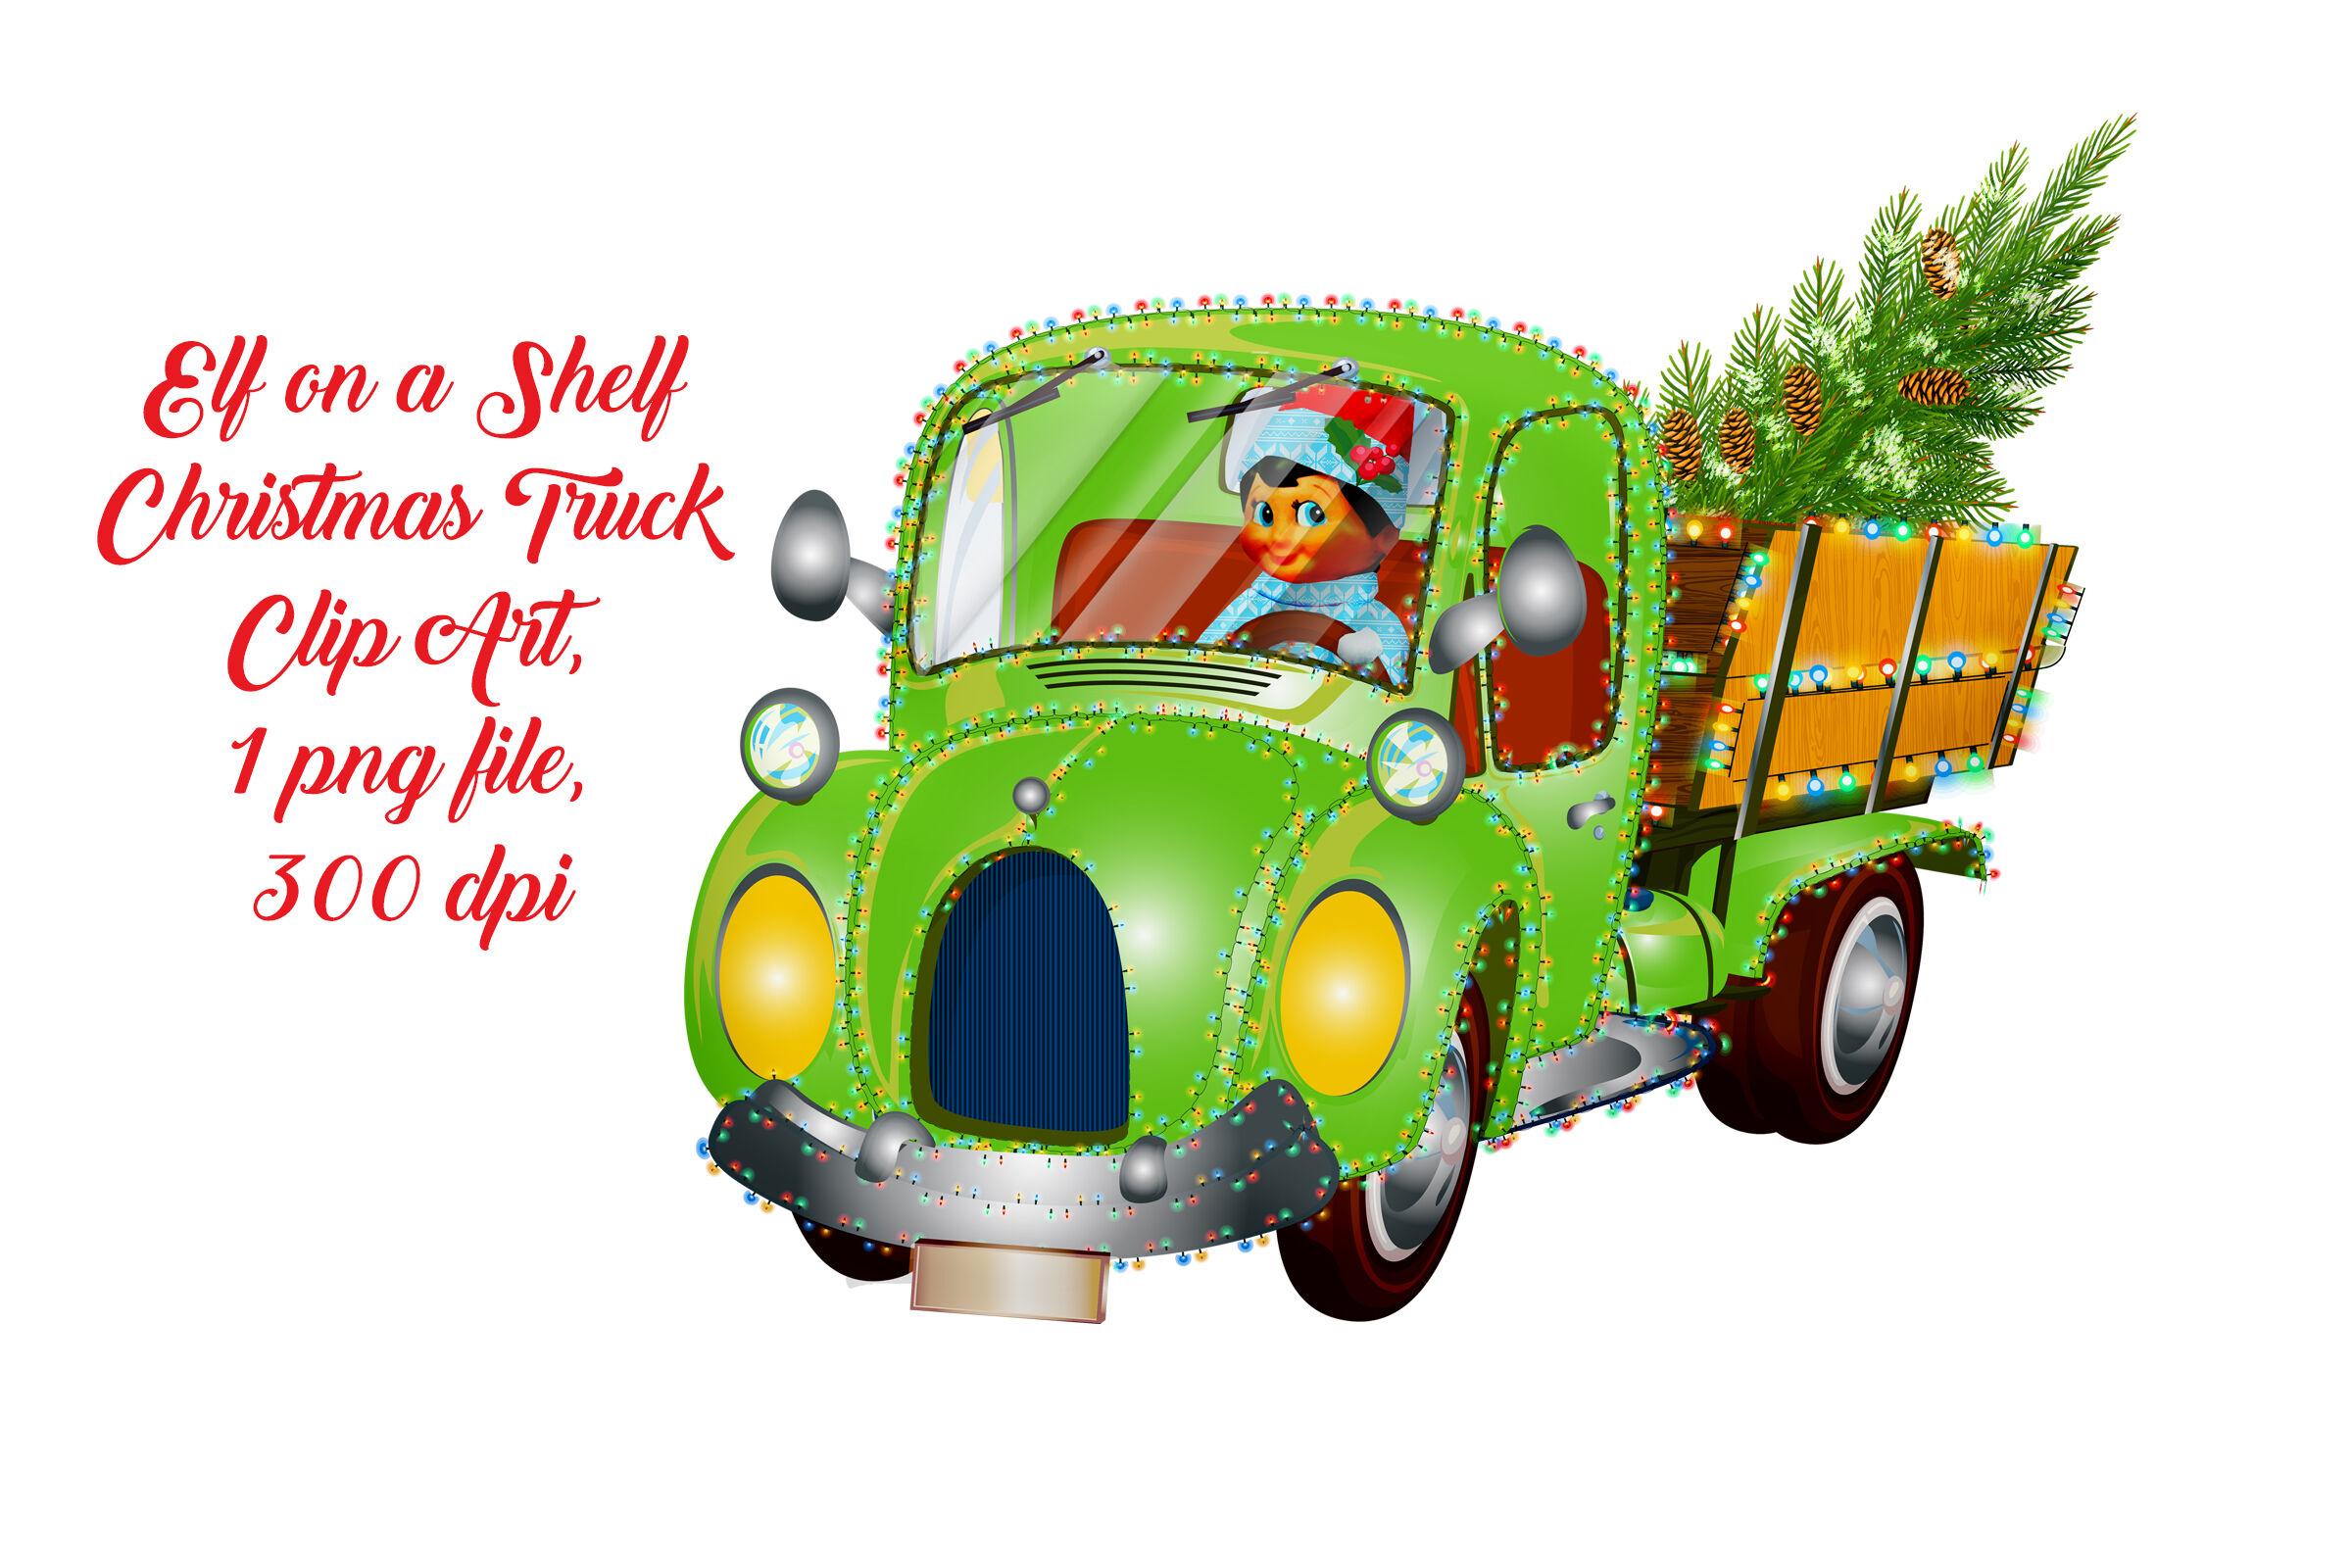 Elf On A Shelf Christmas Truck By Me And Amelie Thehungryjpeg Com